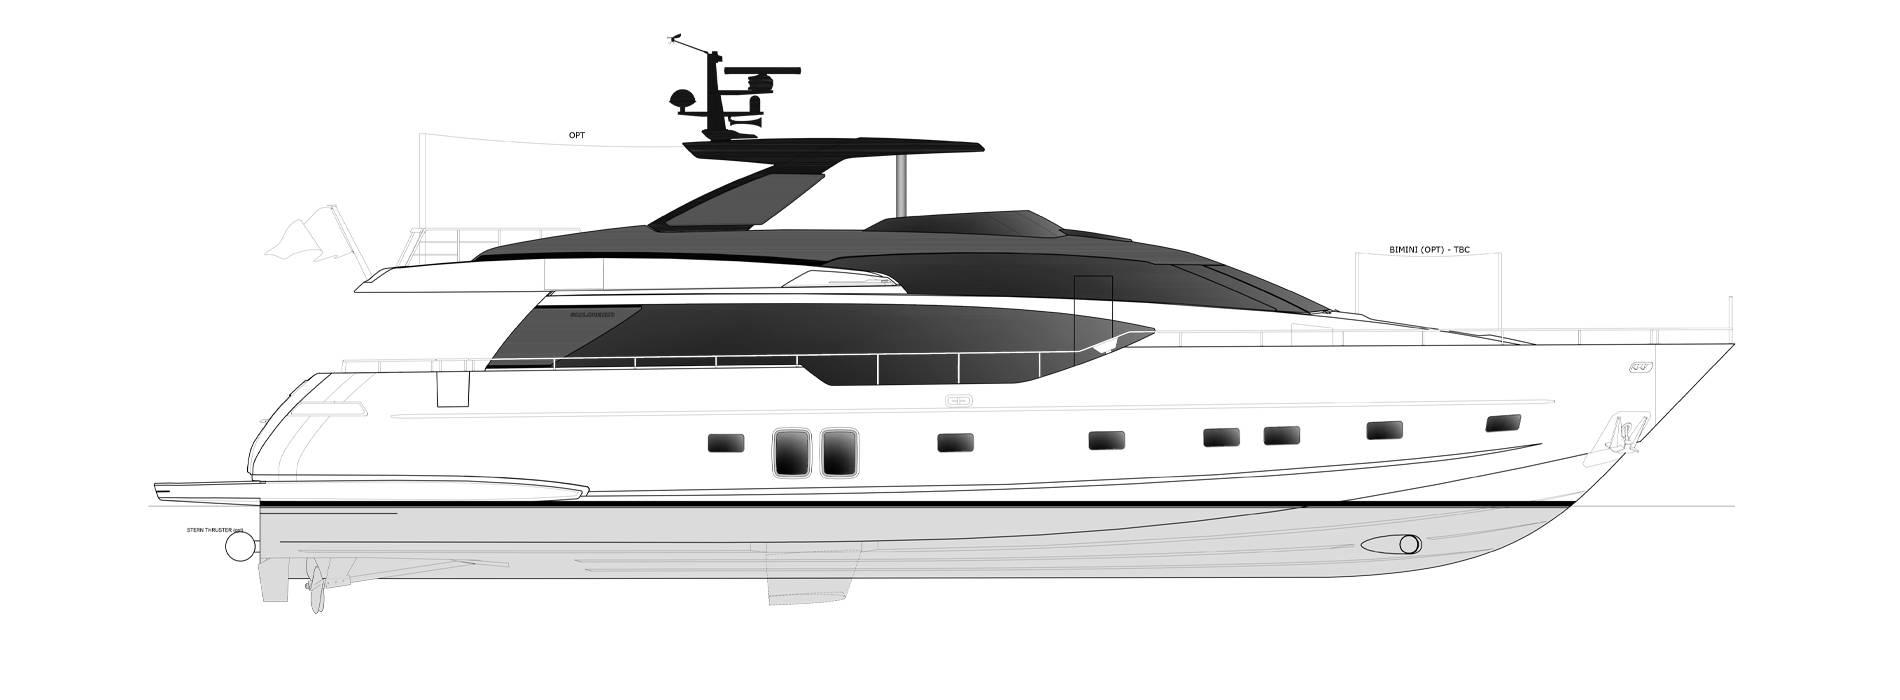 Sanlorenzo Yachts SL86-727 外观